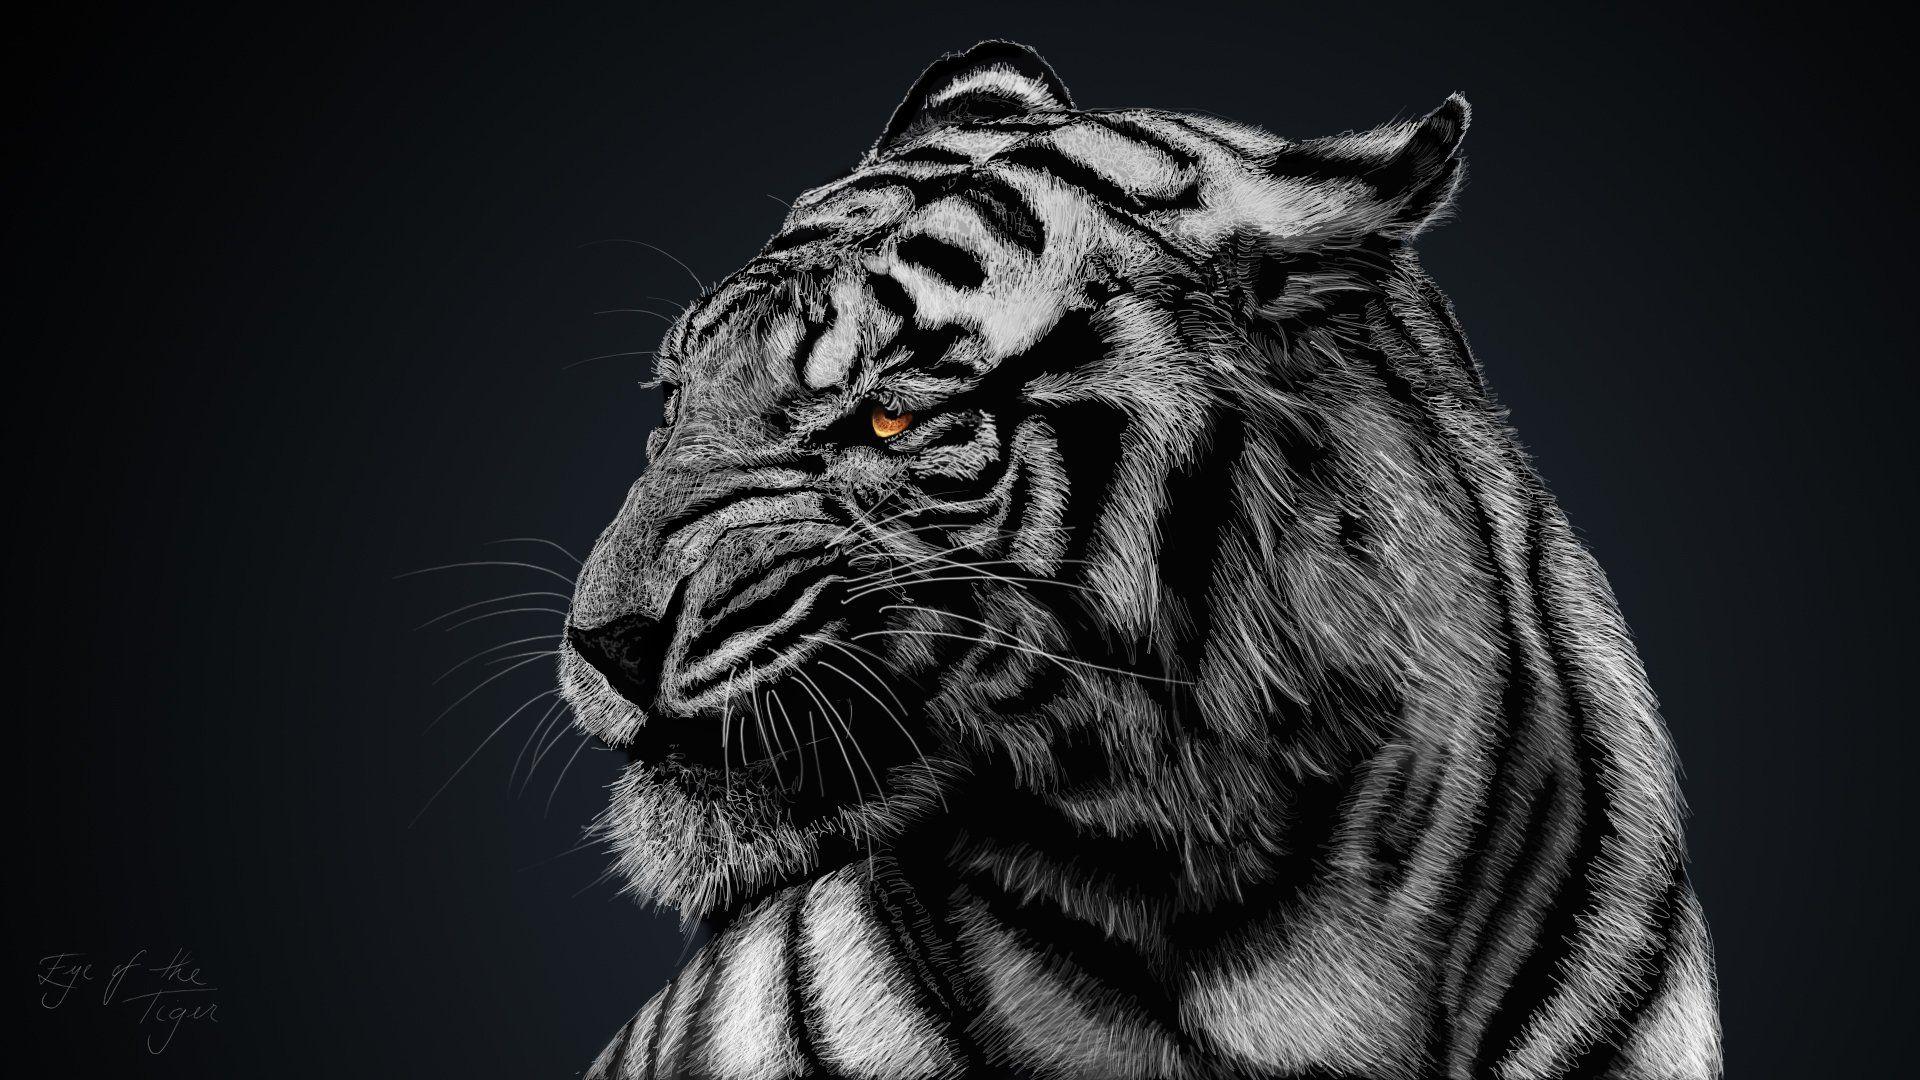 Full HD P Tiger Wallpapers Desktop Backgrounds X